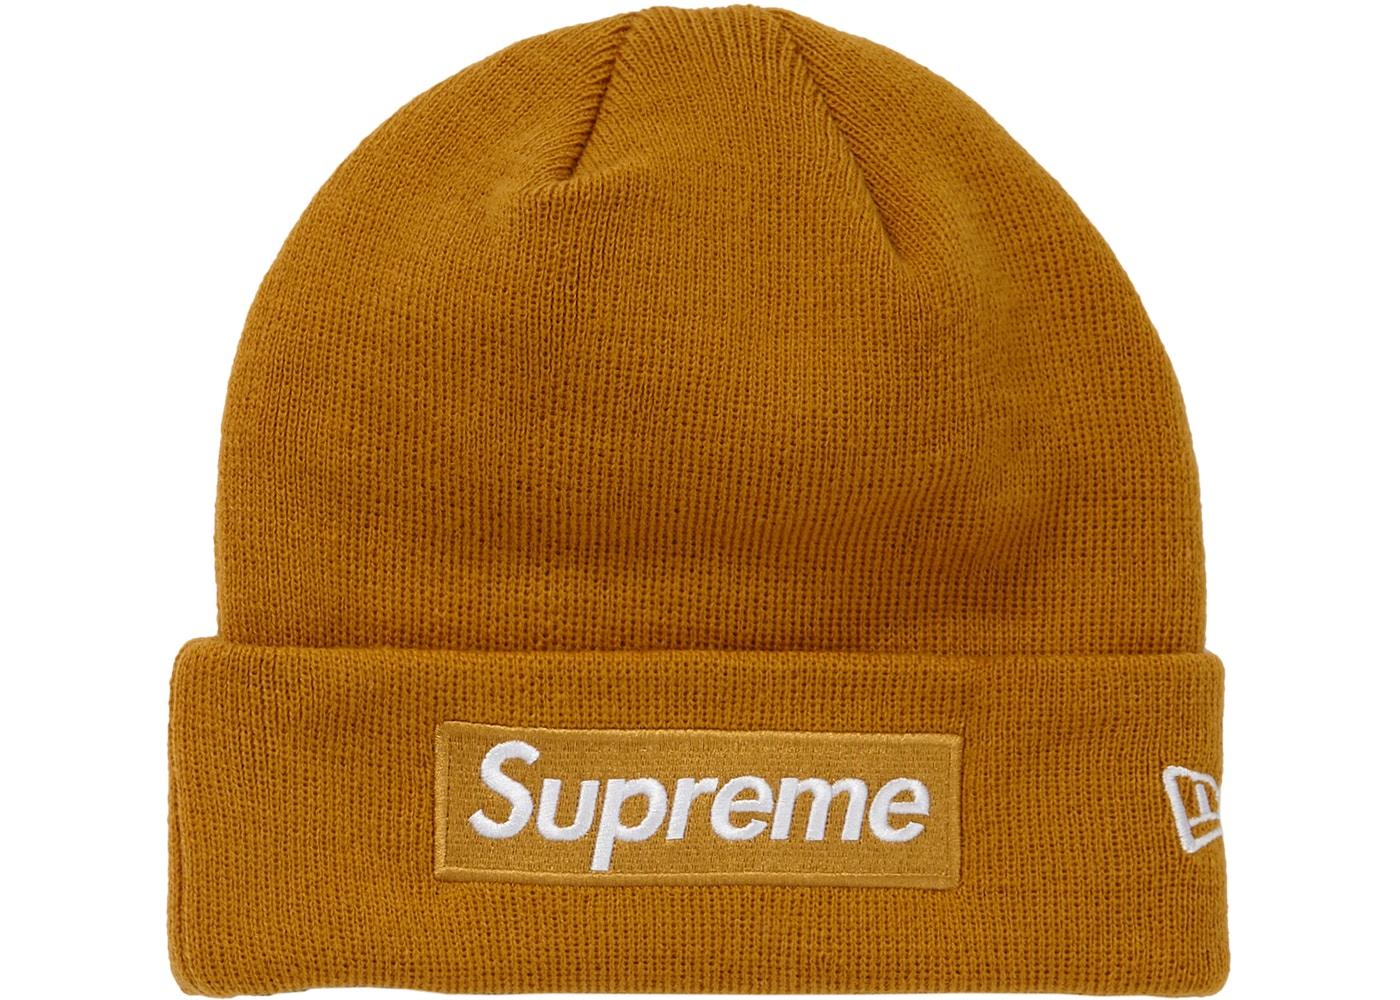 Supreme New Era Box Logo Beanie (FW18) Mustard - FW18 8da15314f0f